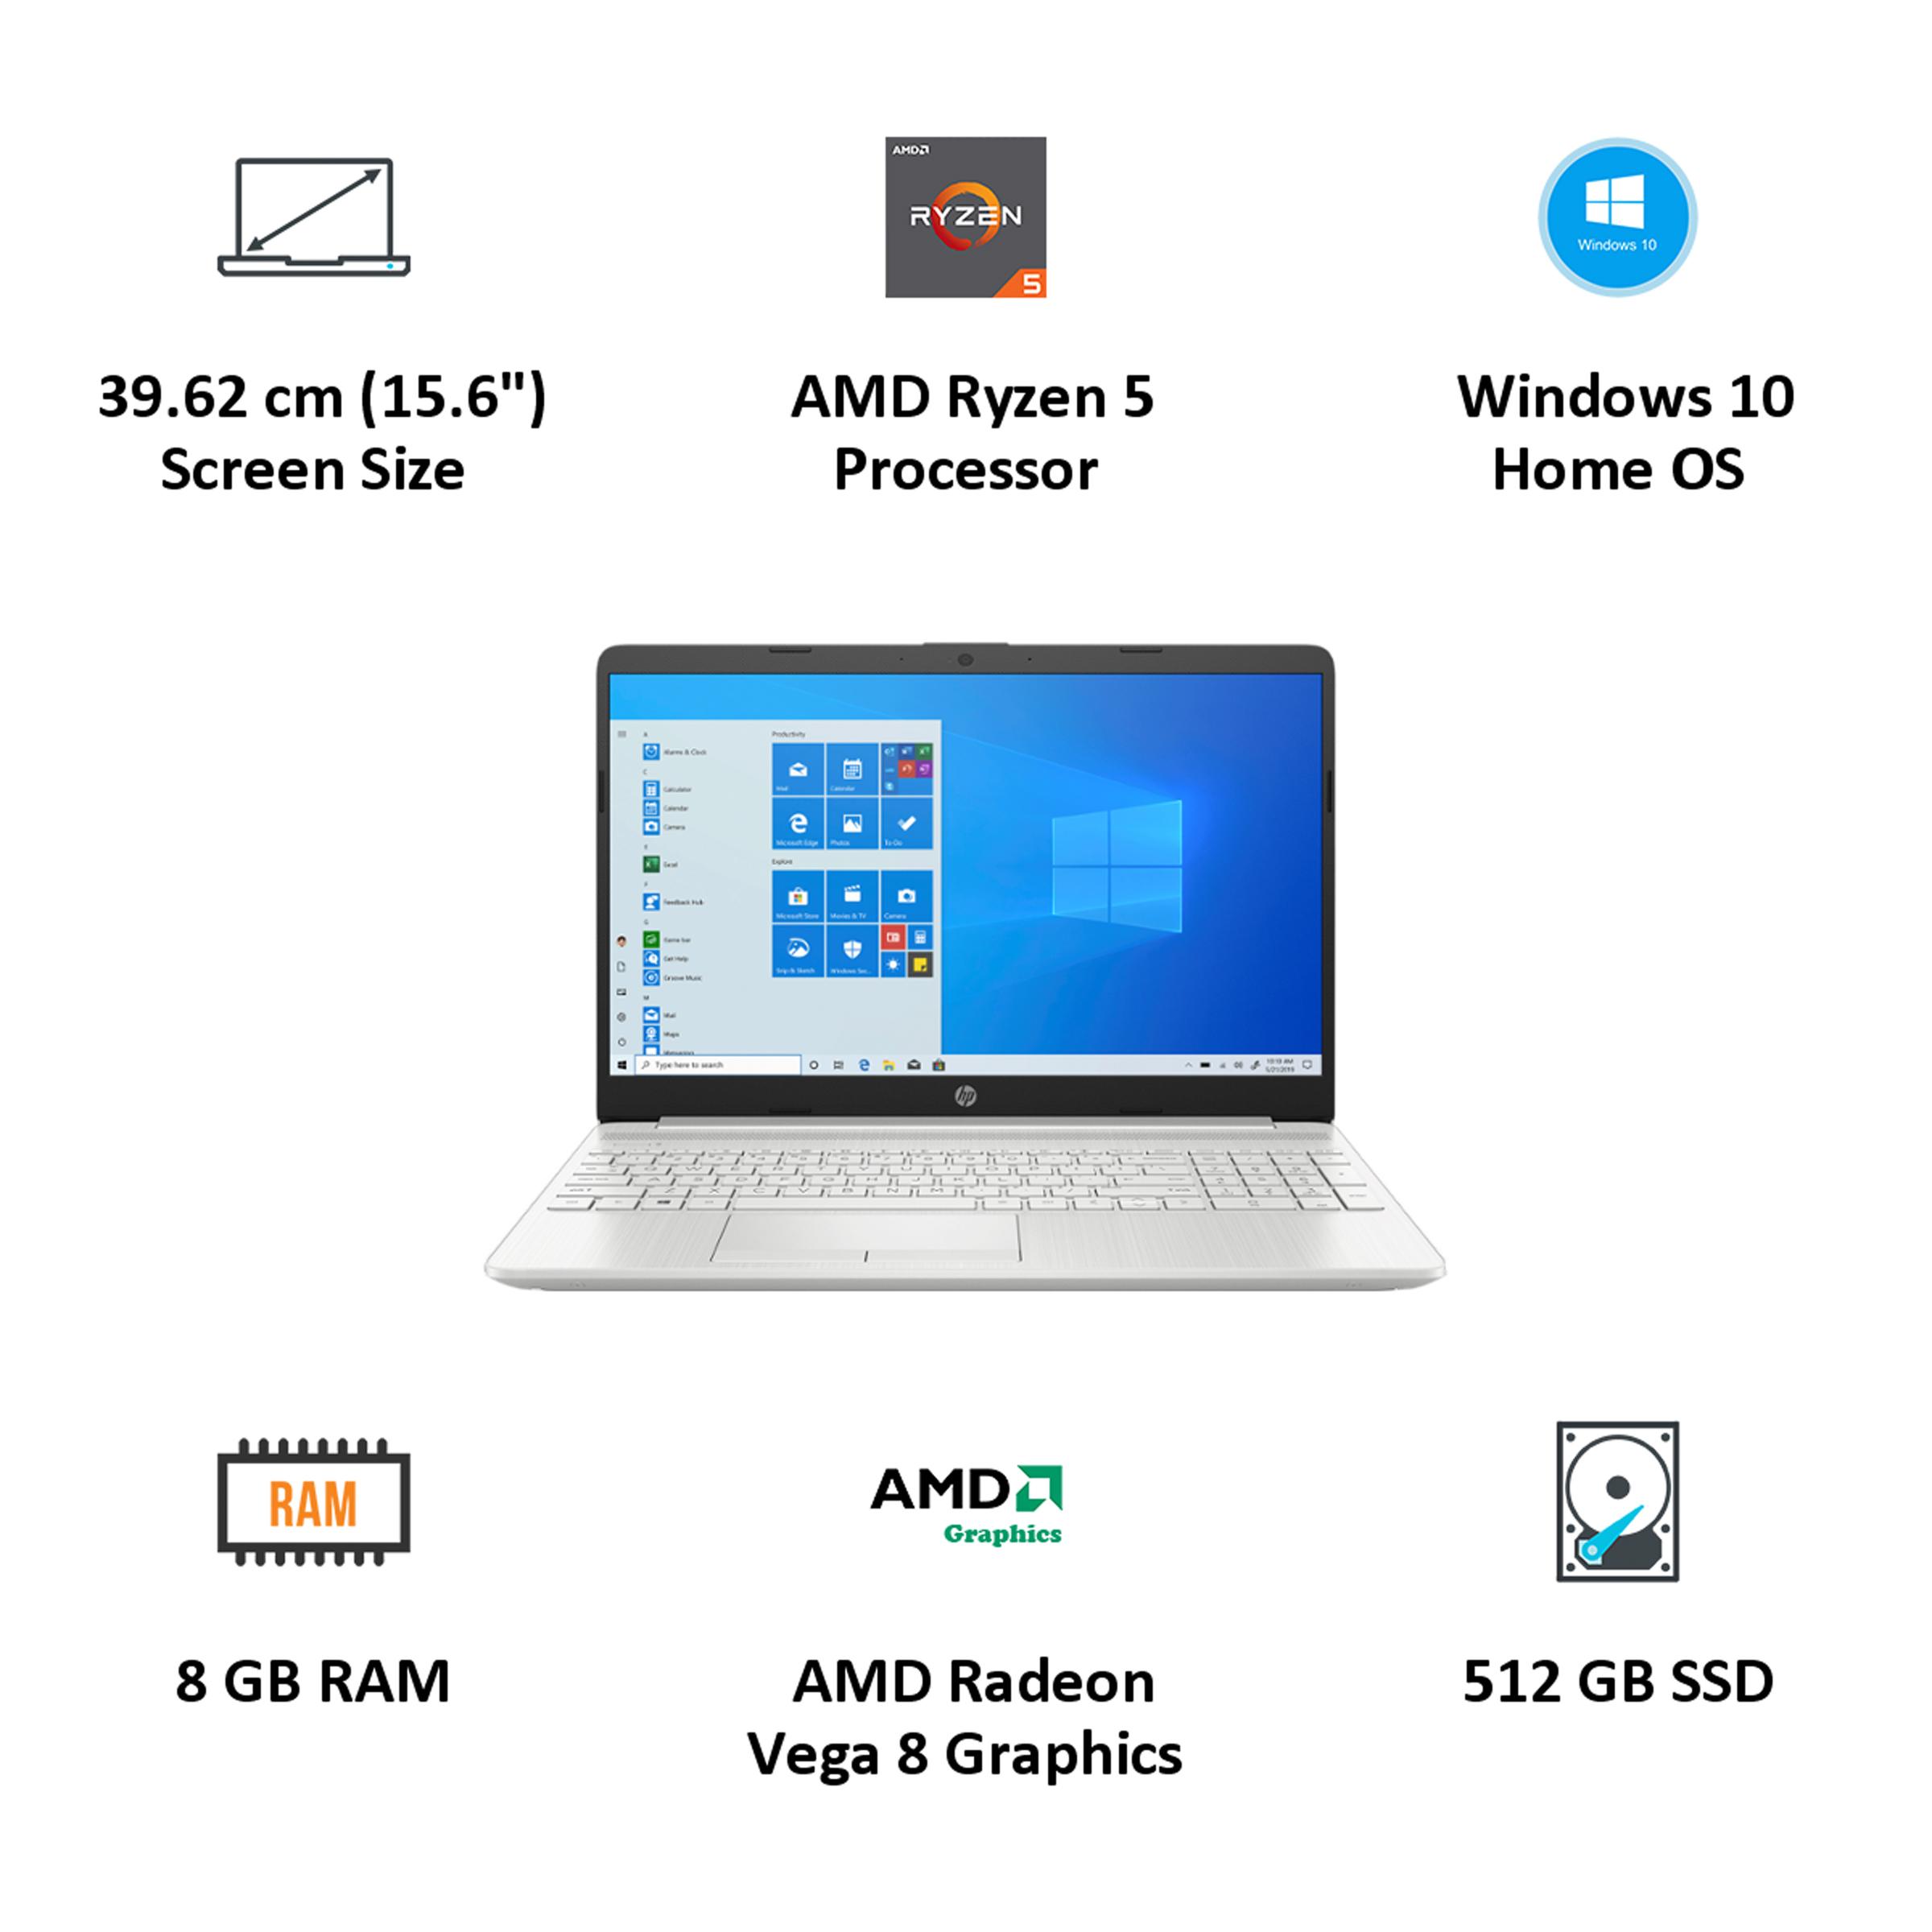 HP 15s-gr0500AU (440L7PA#ACJ) Ryzen 5 Windows 10 Home Laptop (8GB RAM, 512GB SSD, AMD Radeon Vega 8 Graphics, MS Office, 39.62cm, Natural Silver) 4